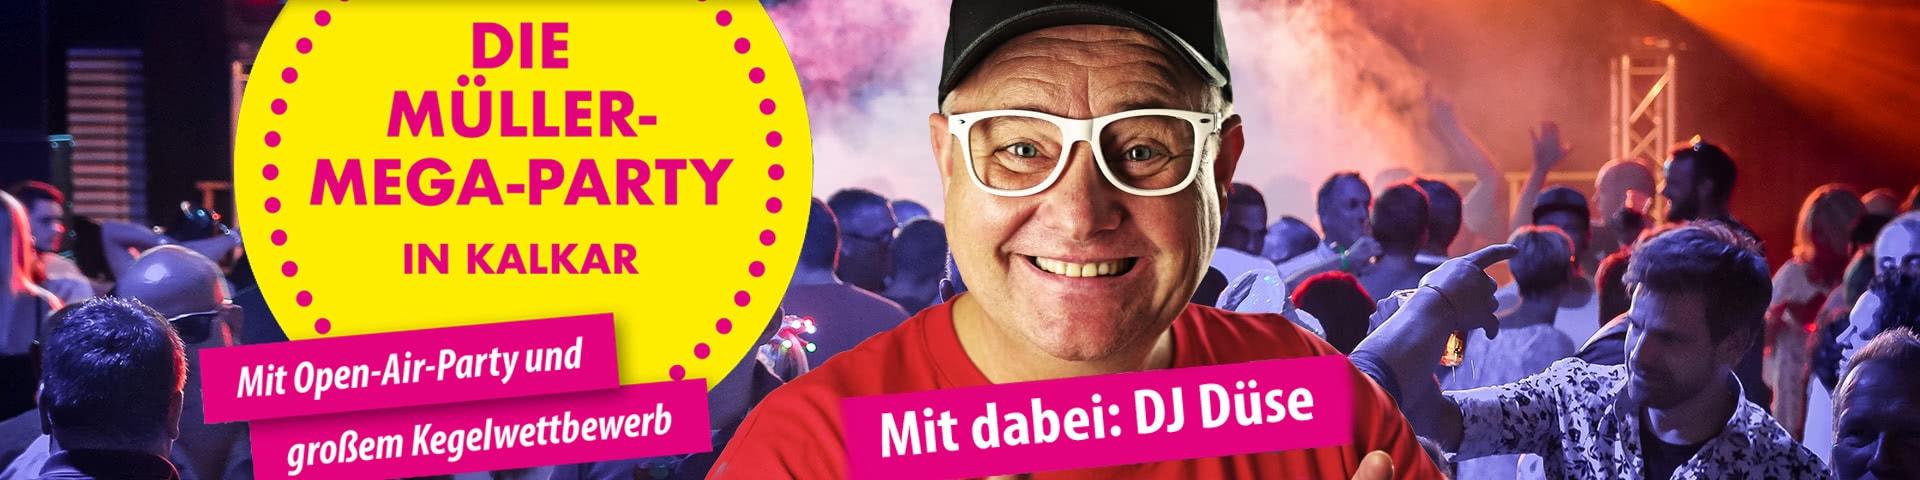 Die Müller-Mega-Party in Kalkar mit DJ Düse